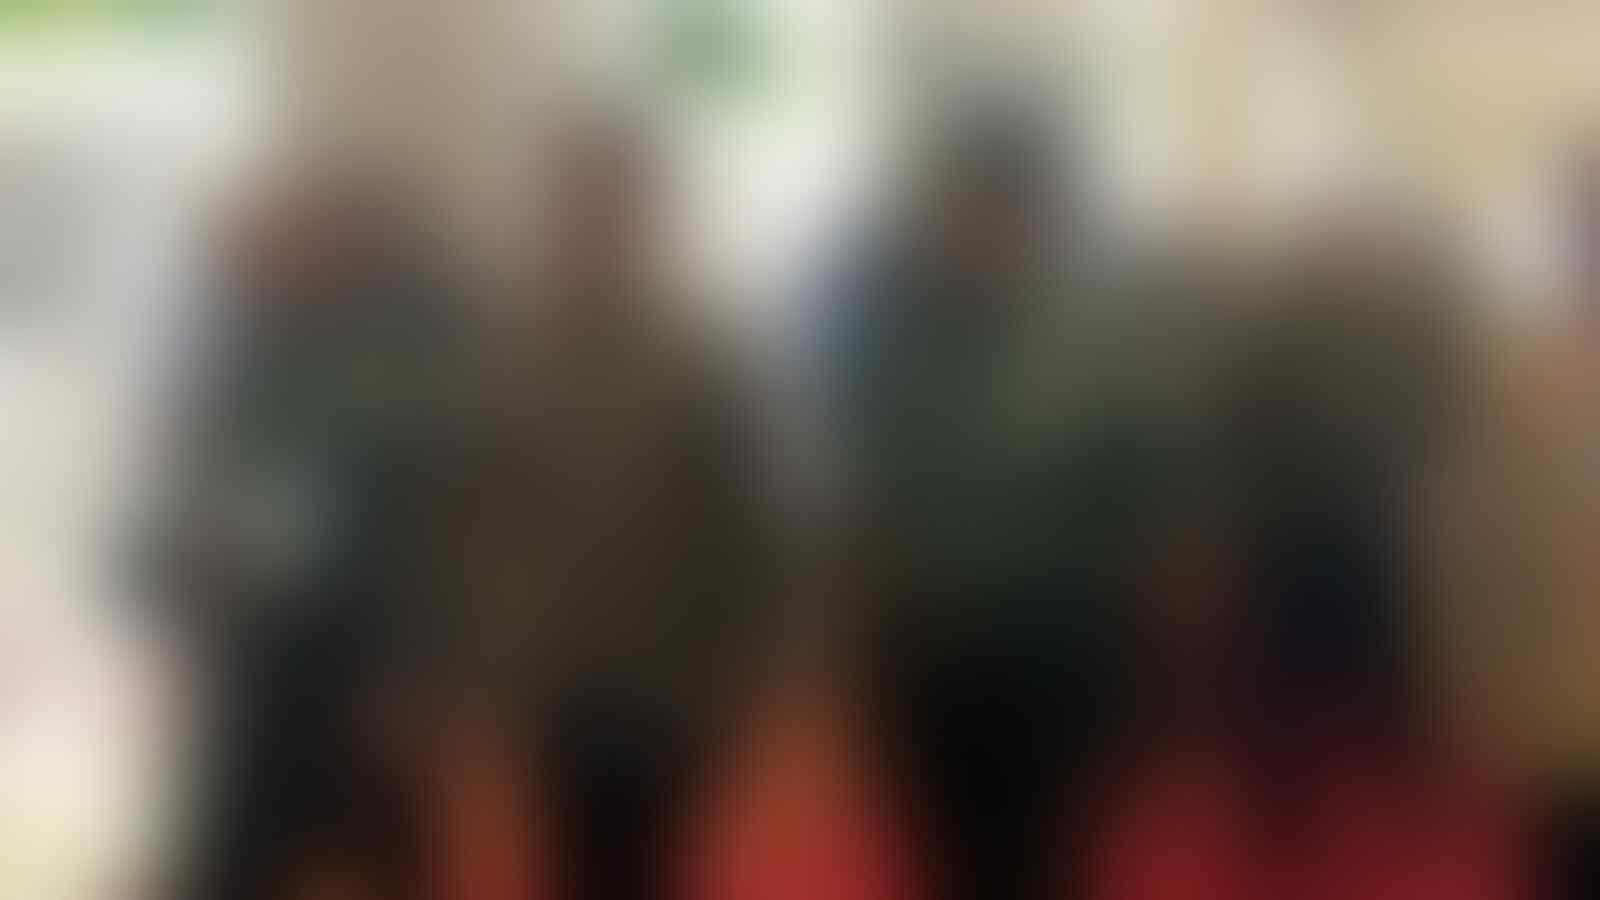 KSAD: Generasi Milenial Mudah Terkontaminasi Budaya Asing